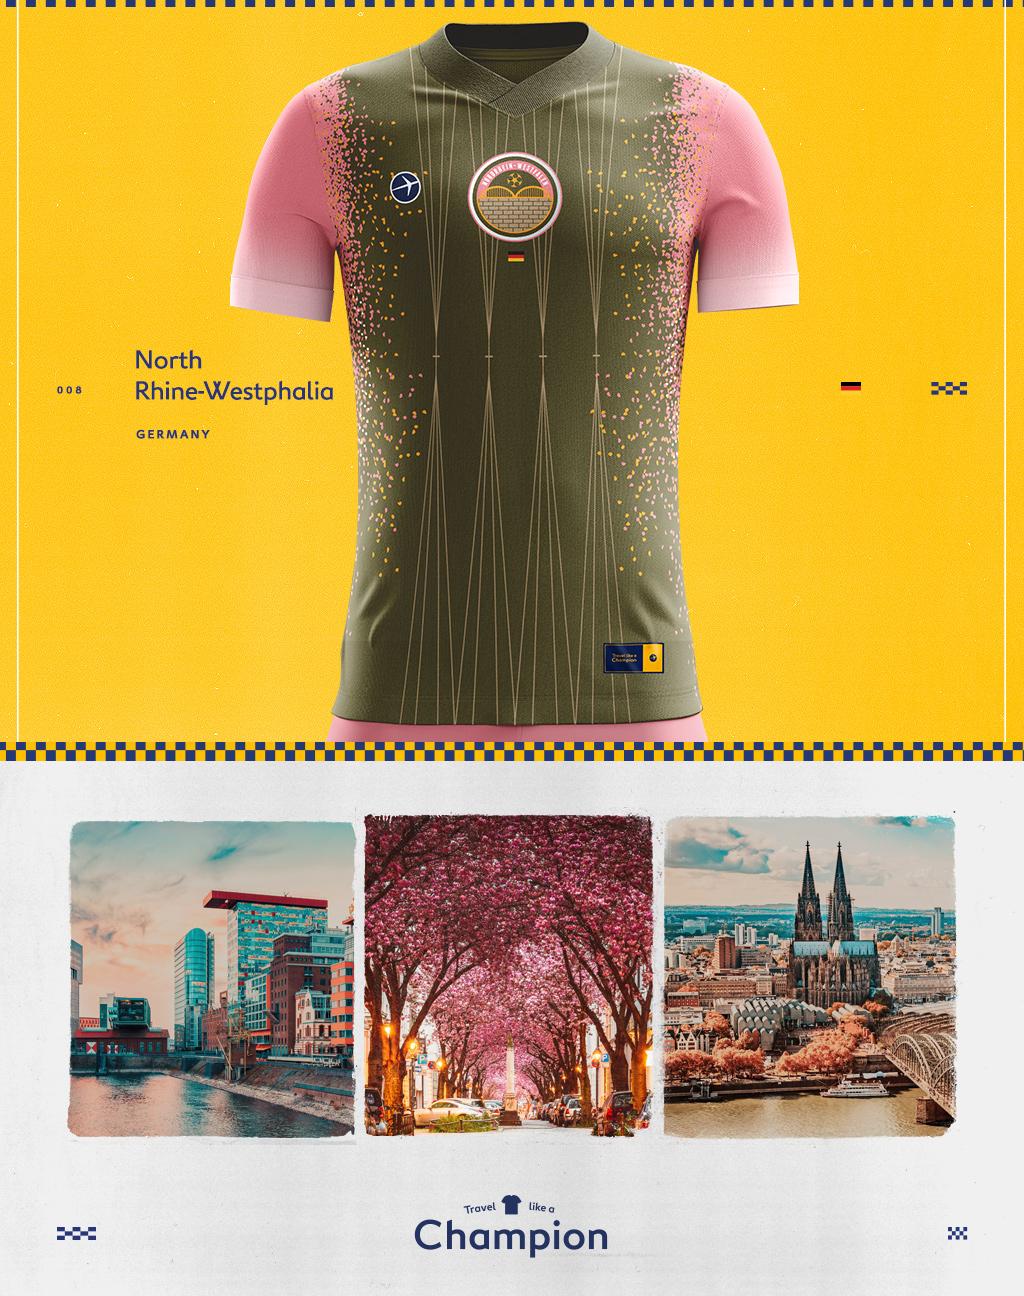 008-nordrhein-blog-article-1024x1296-uk.jpg?1555974580